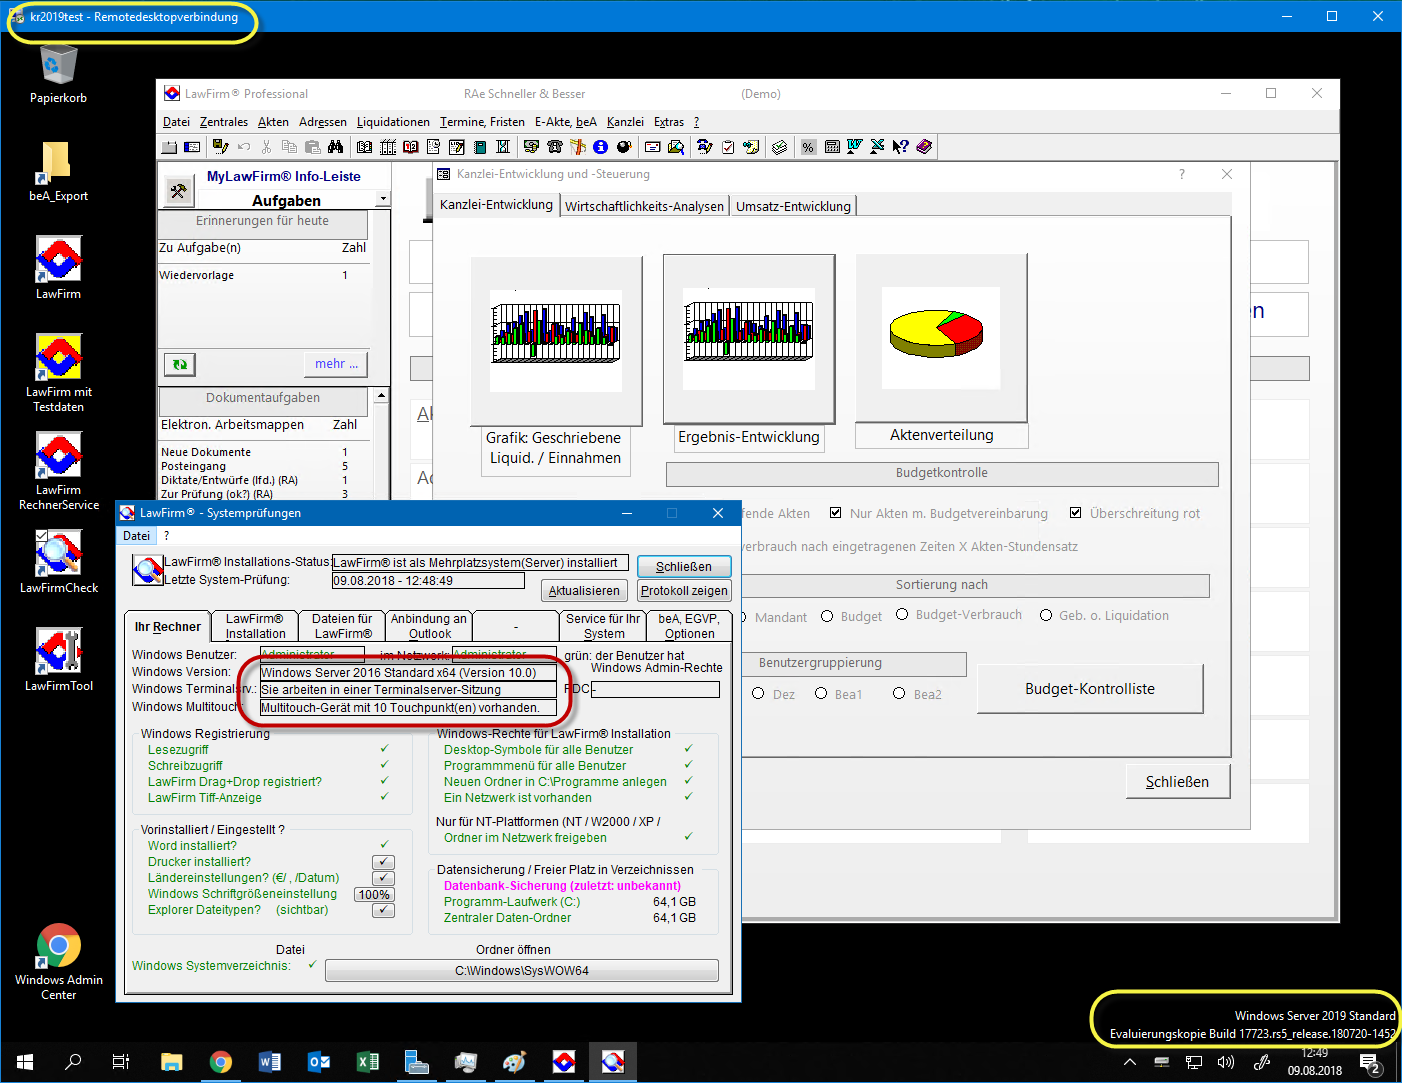 LawFirm mit Windows Server 2019 (Preview-Version) getestet